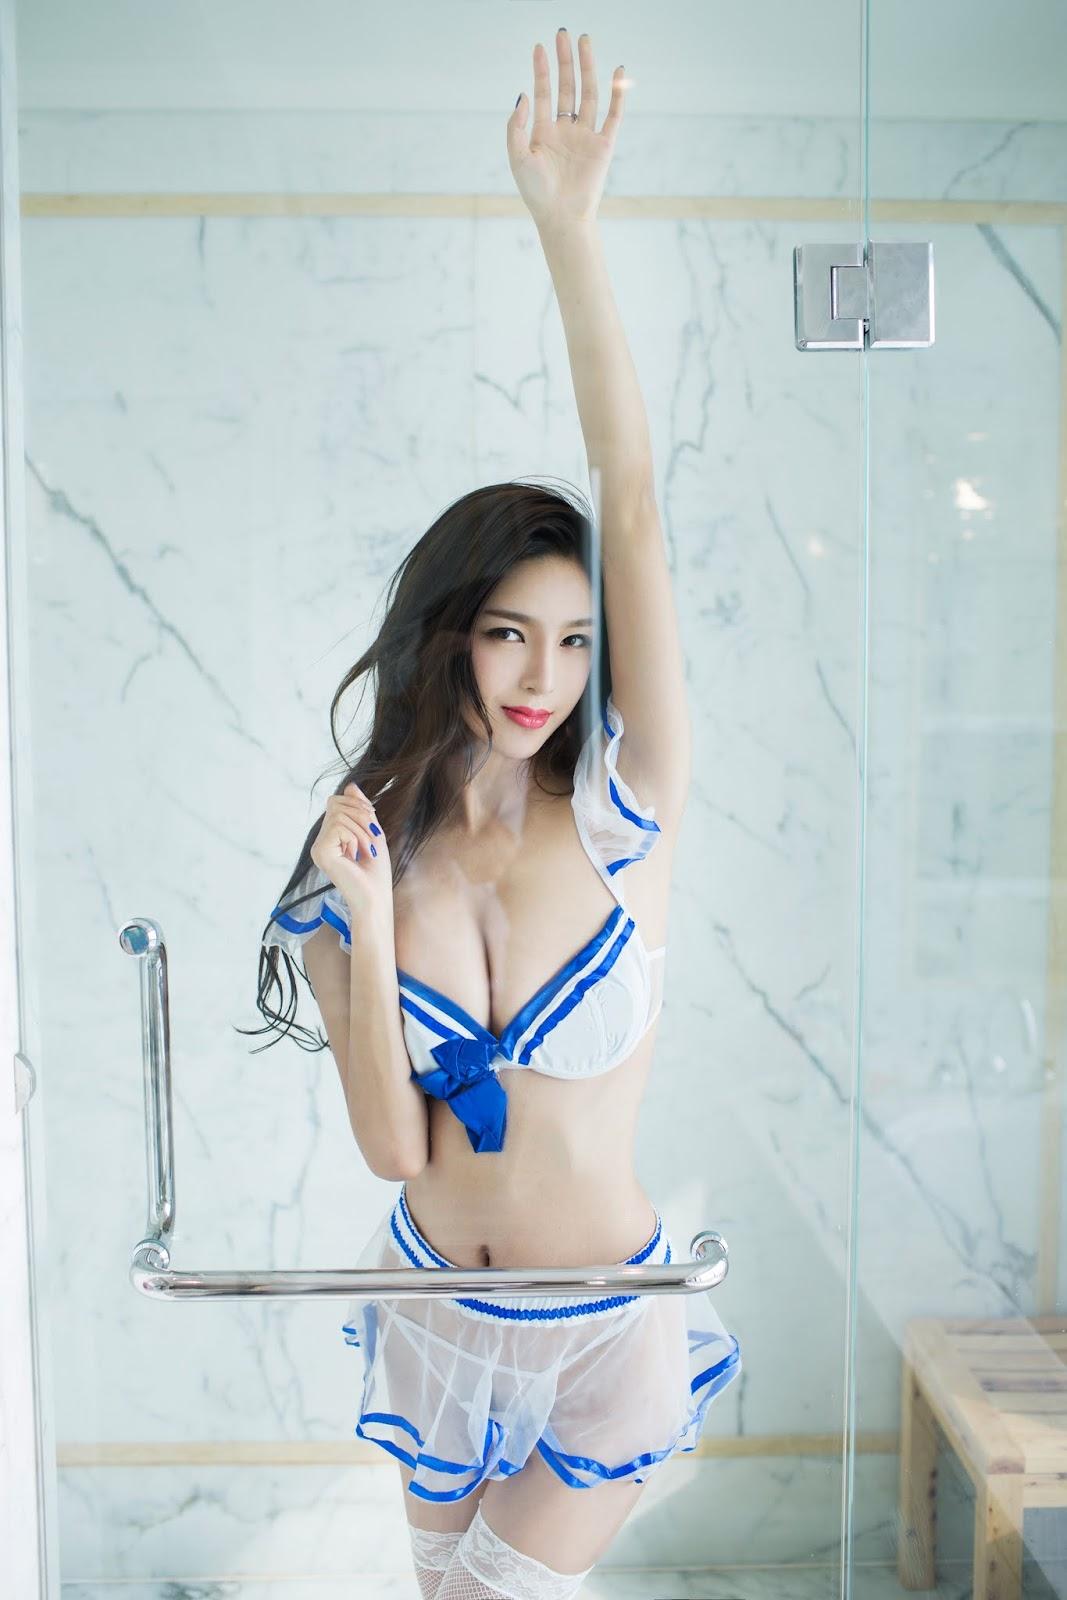 %255BTuiGirl %25C2%25A6%252B%25C2%25AB%252B%252B%255D%2BNo.042%2B%252B%25C3%25BA%252B%253D%252B%2529%2B%252841%2529 - beautiful Asian Model TUIGIRL NO.42